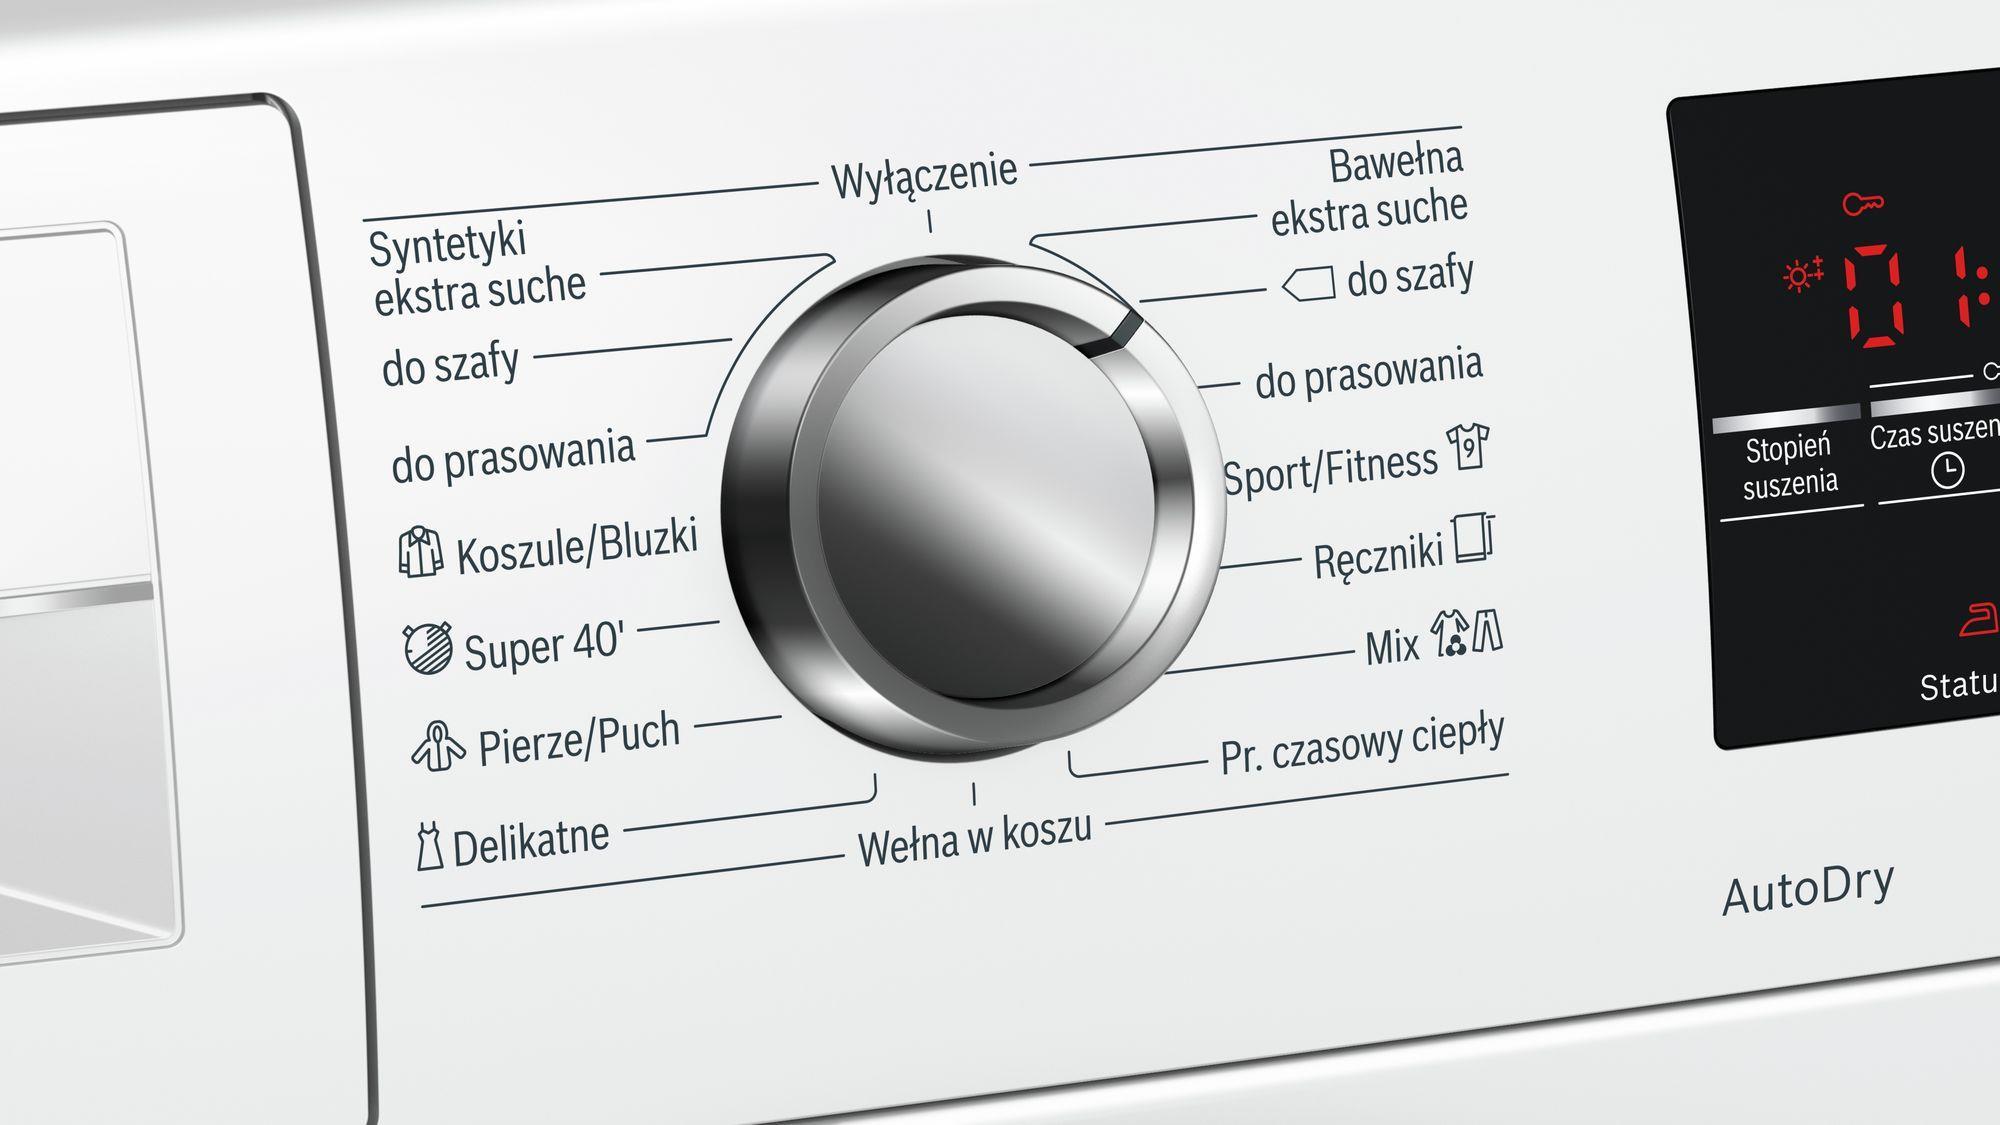 Dryer    BOSCH  WTW8546KPL (9 kg; 599 mm) WTW8546KPL Veļas žāvētājs